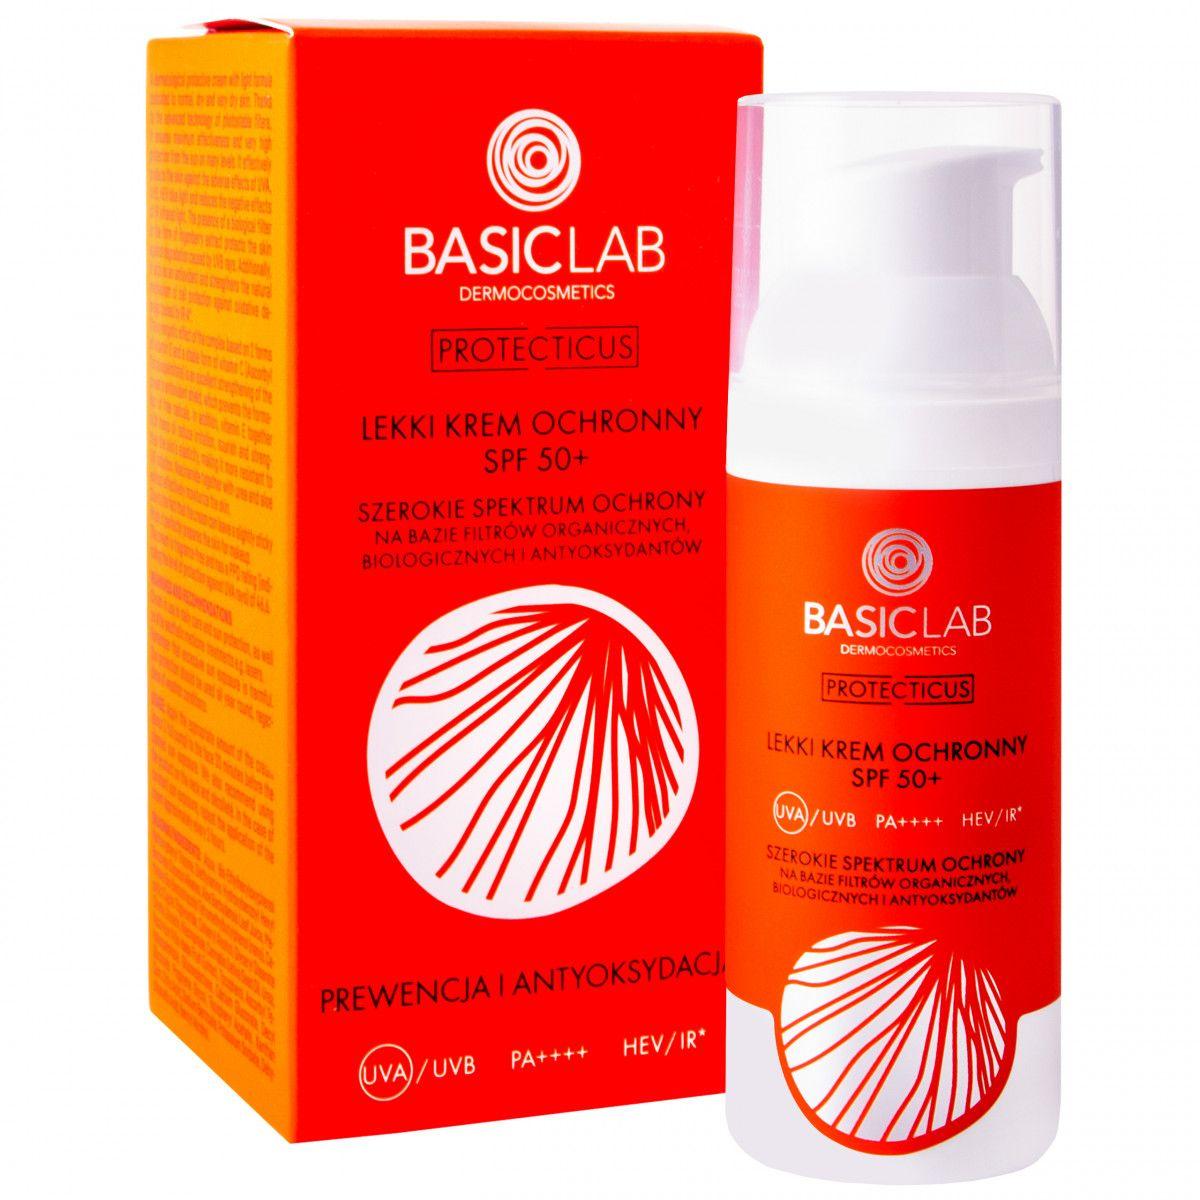 BasicLab Protecticus SPF 50+ lekki krem ochronny 50 ml